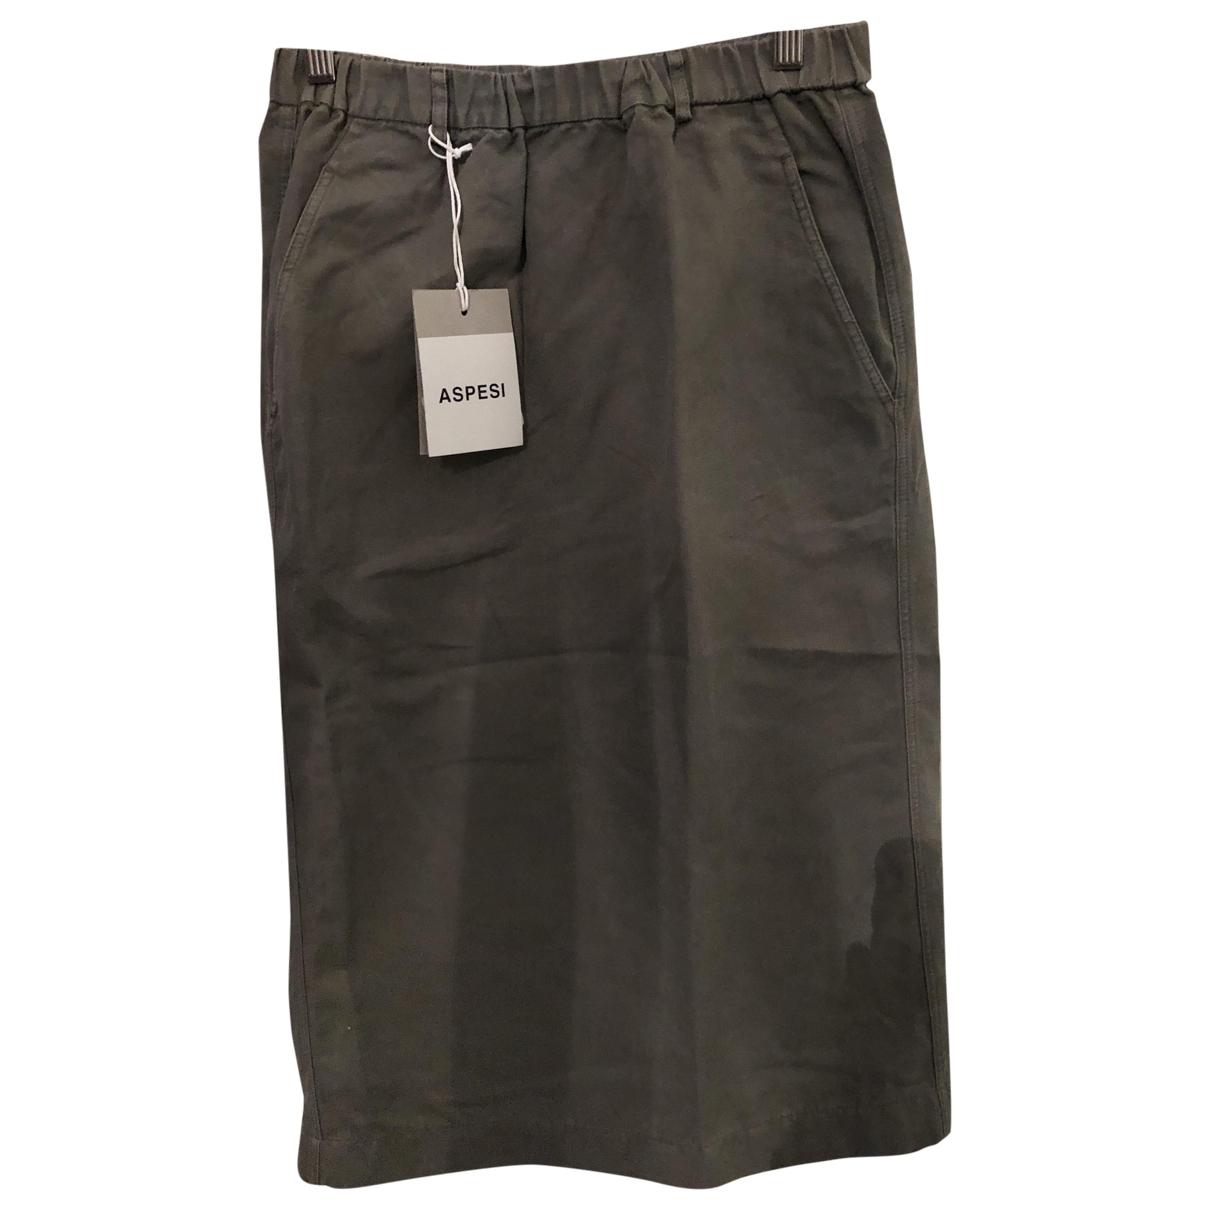 Aspesi \N Khaki Cotton skirt for Women 42 IT